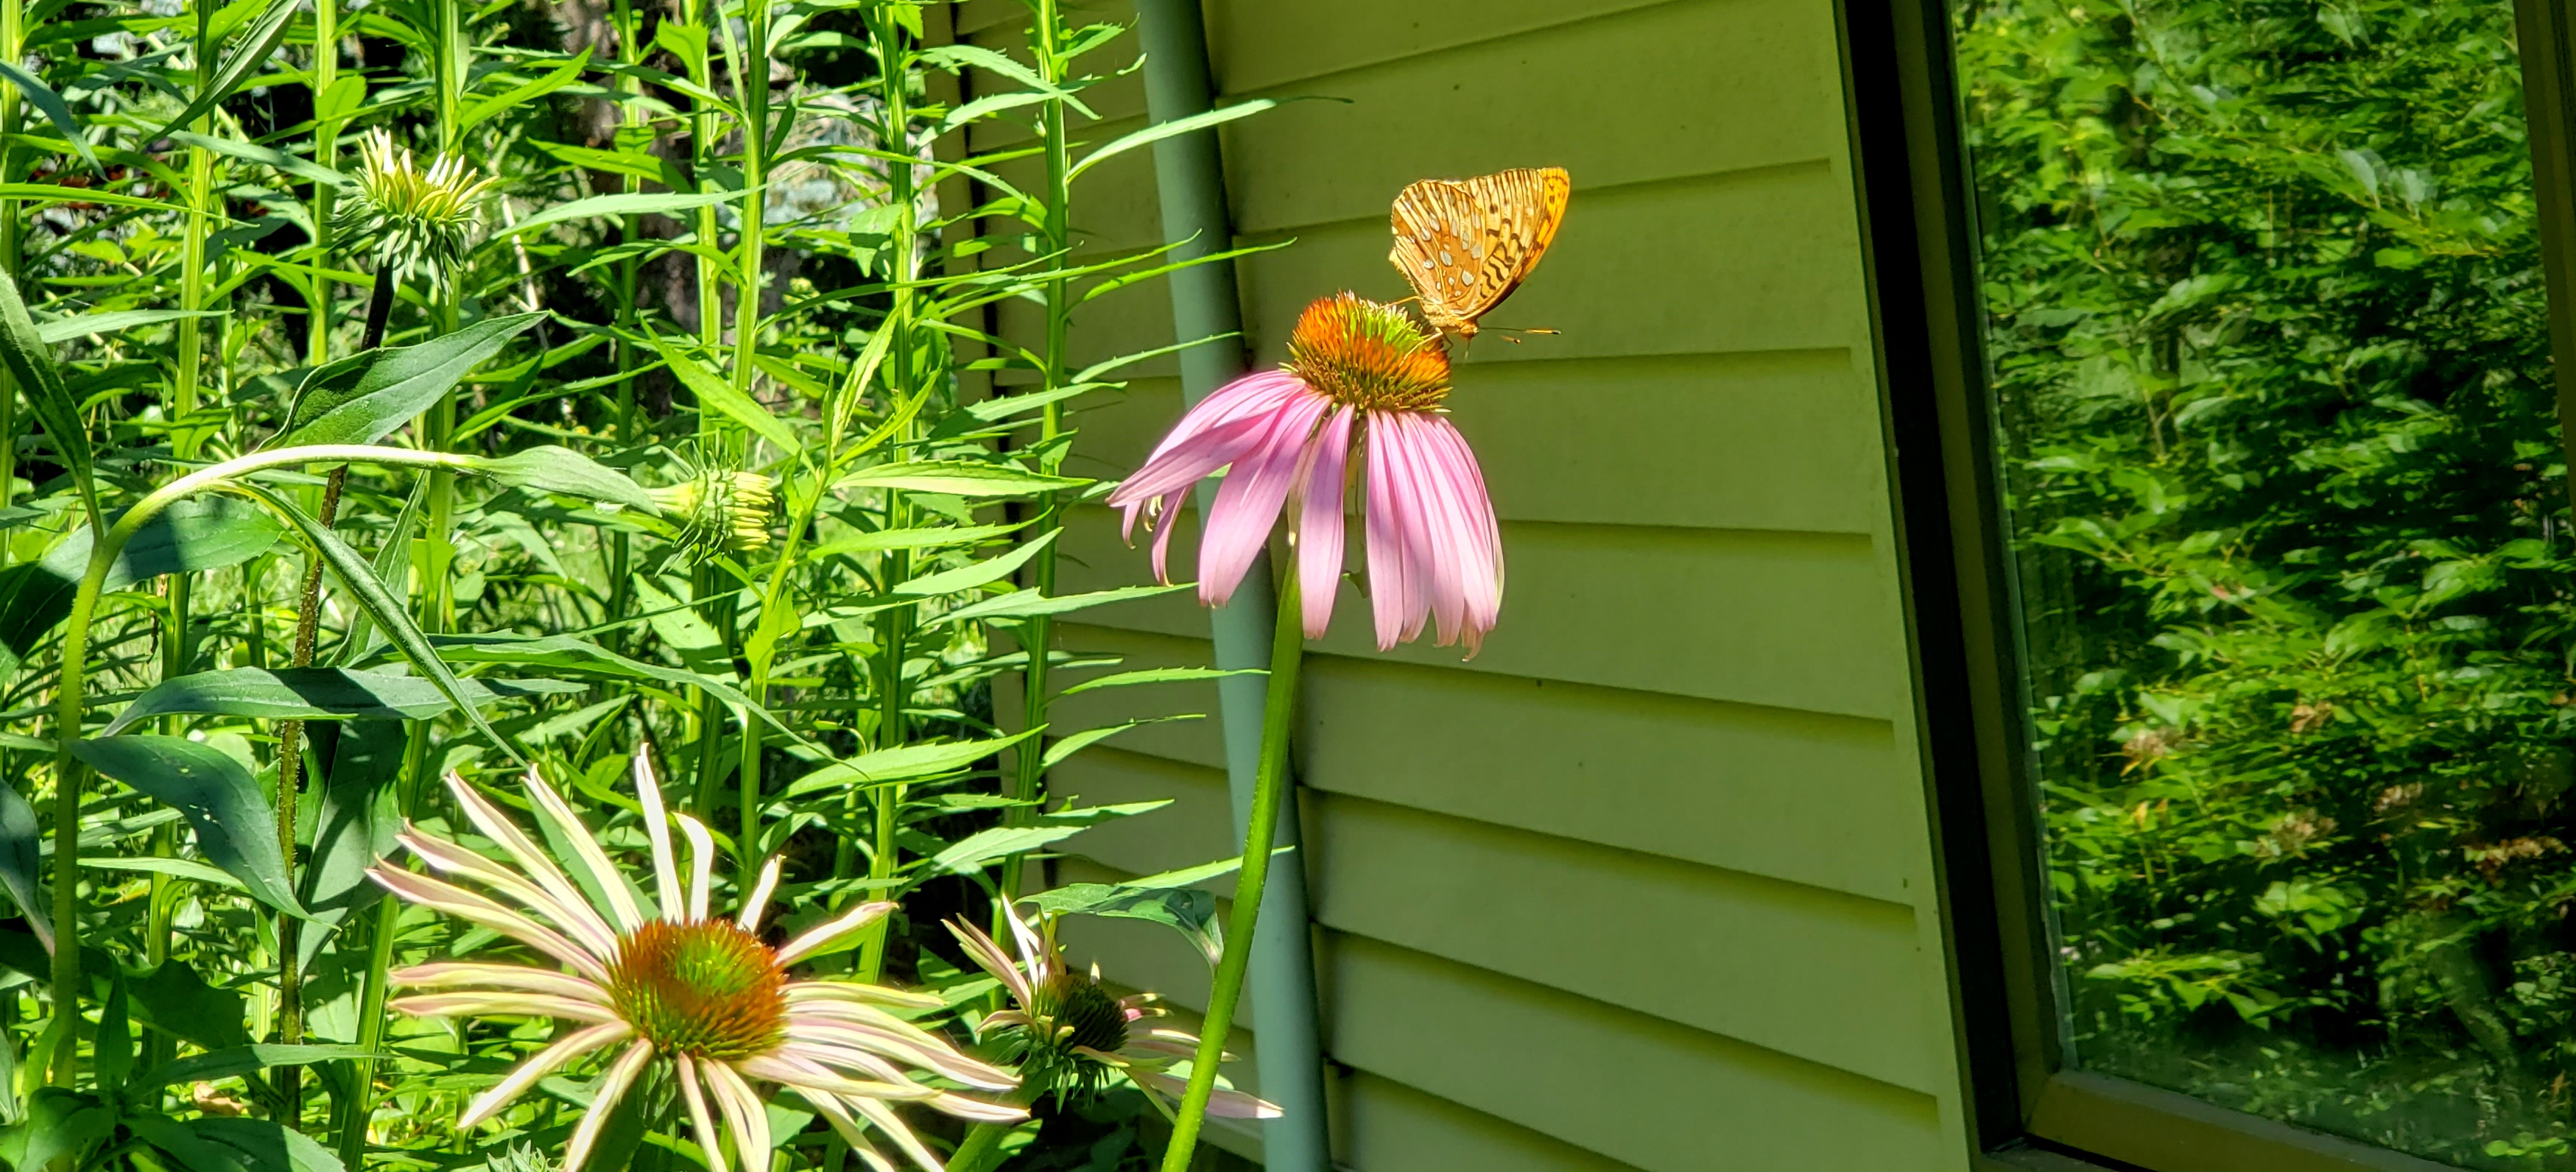 fritillarybutterflyechinaceaflowersunglowreflectionfruitguild19July2020